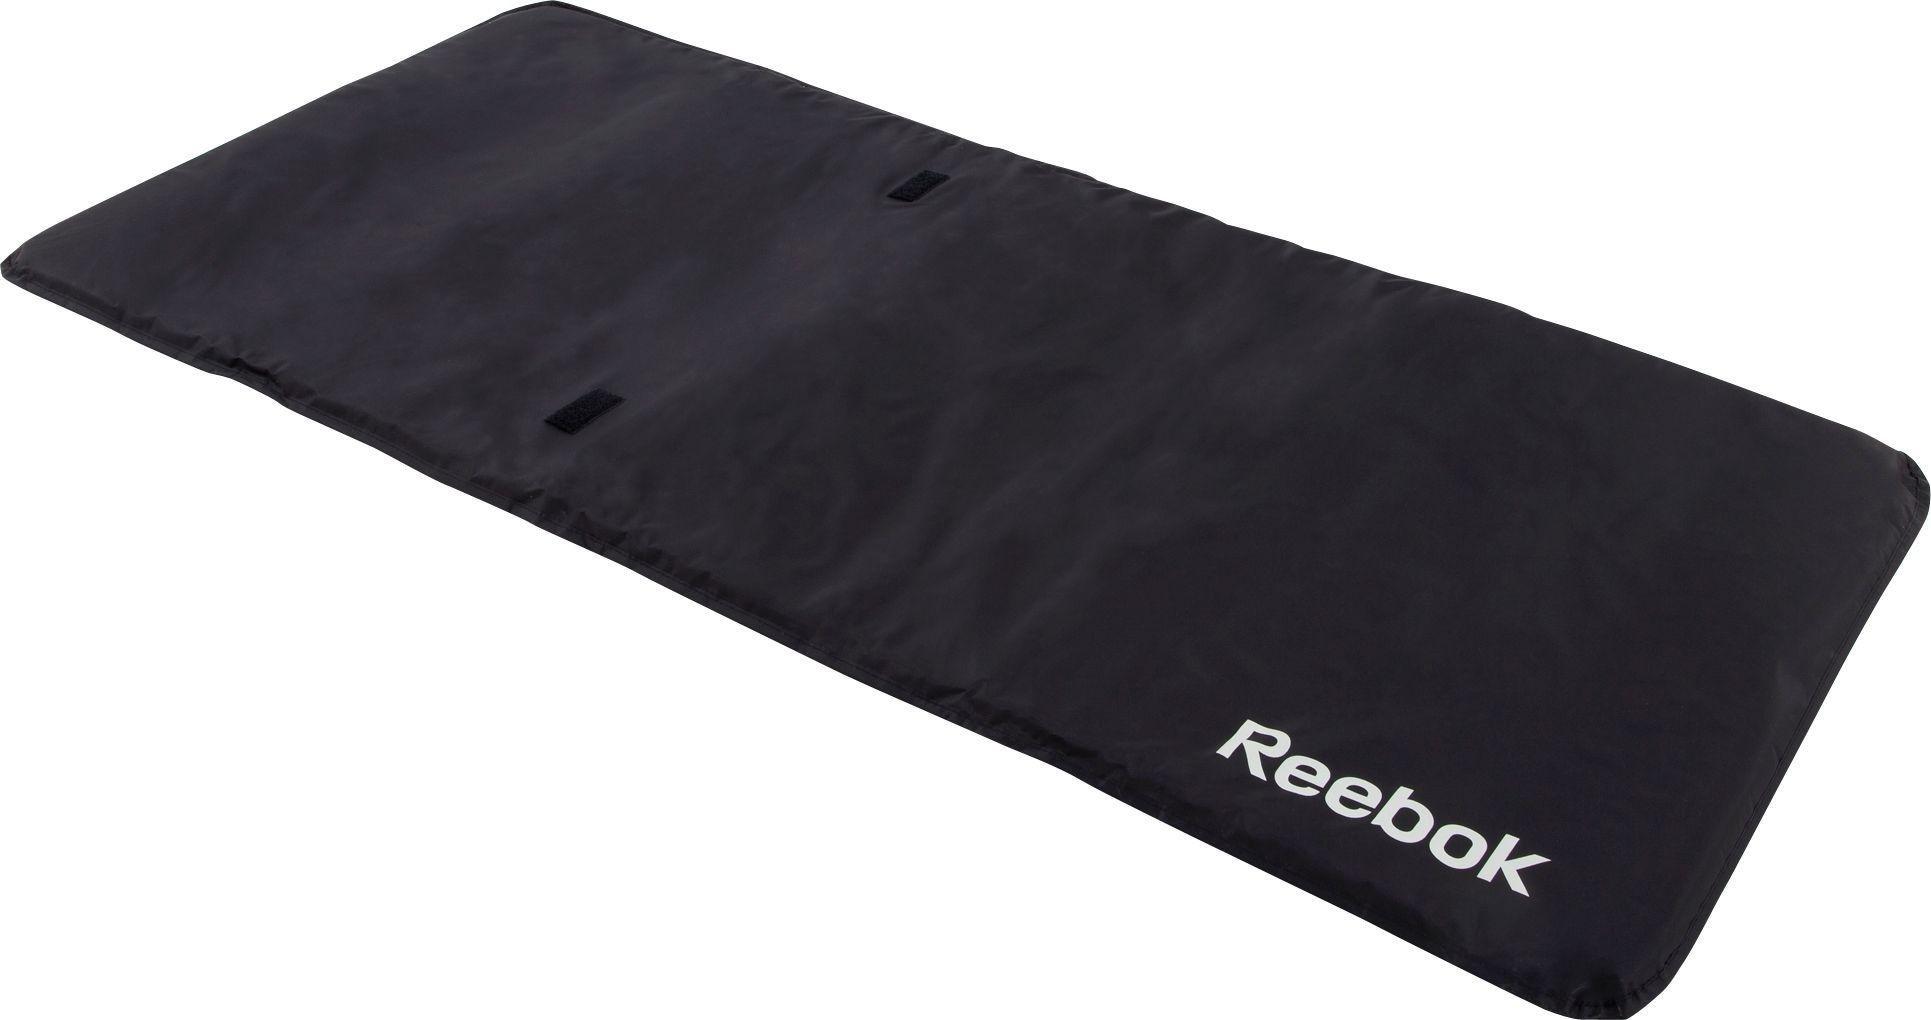 reebok exercise mat